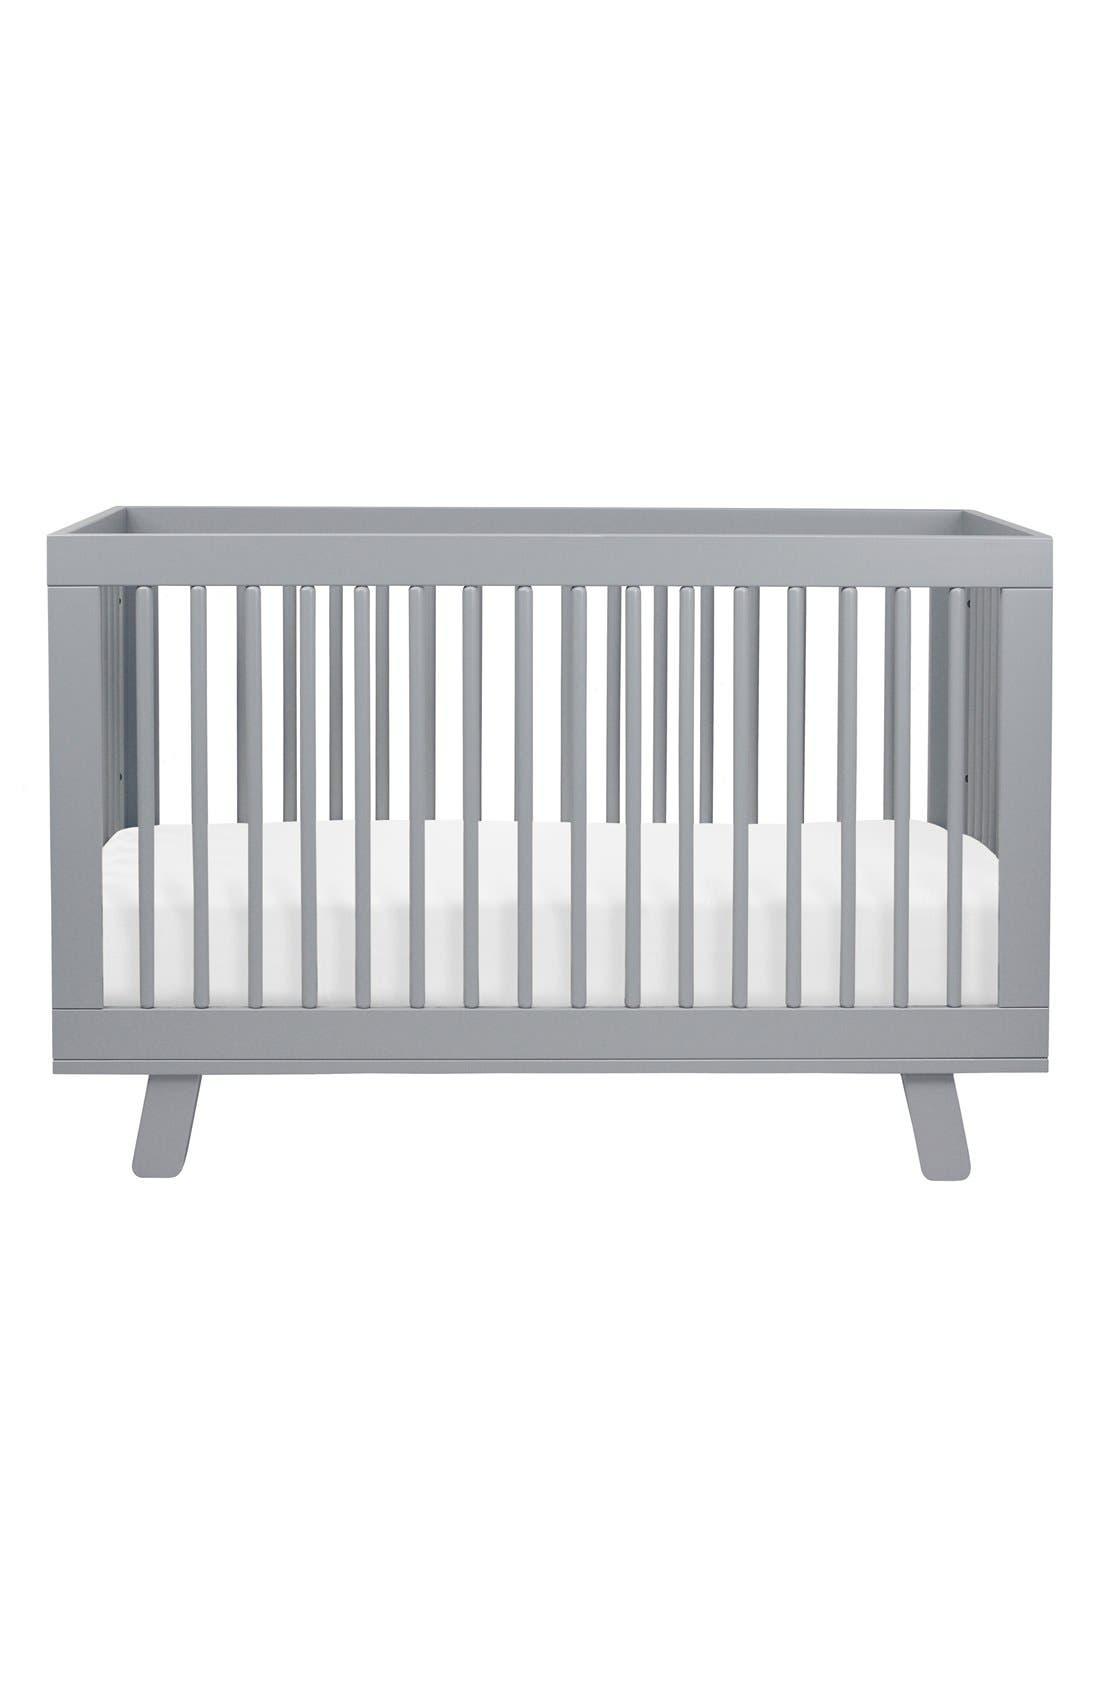 babyletto 'Hudson' 3-in-1 Convertible Crib